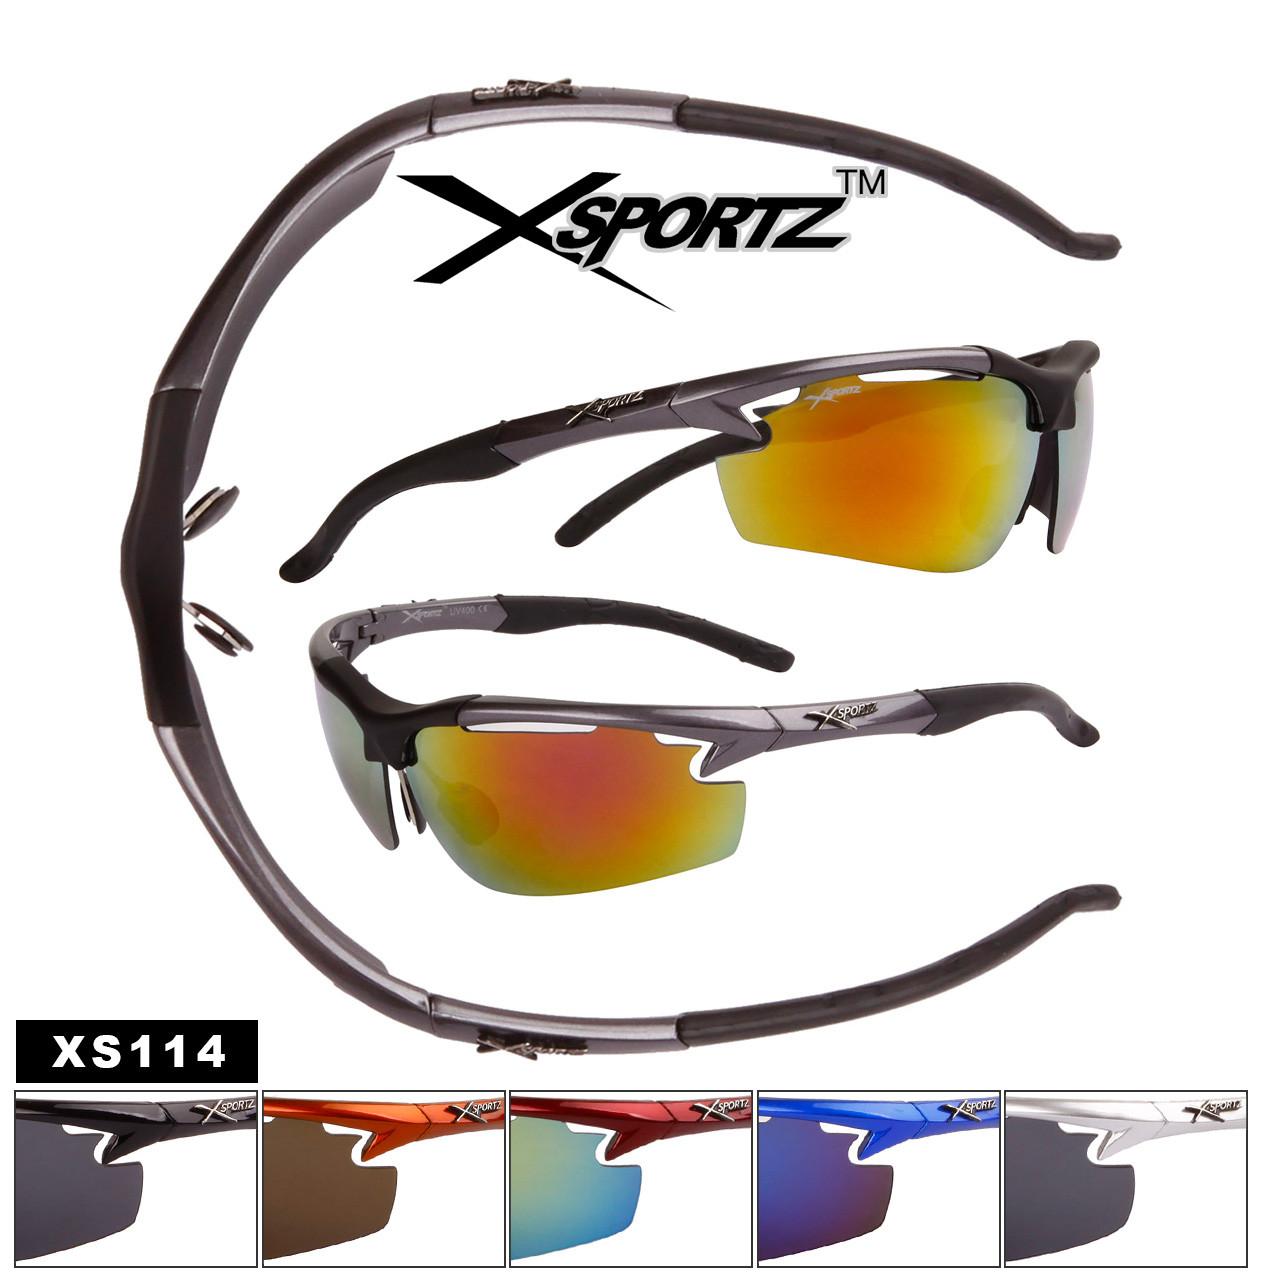 Xsportz™Half-Rim Wrap Around Sport Sunglasses - Style #XS114